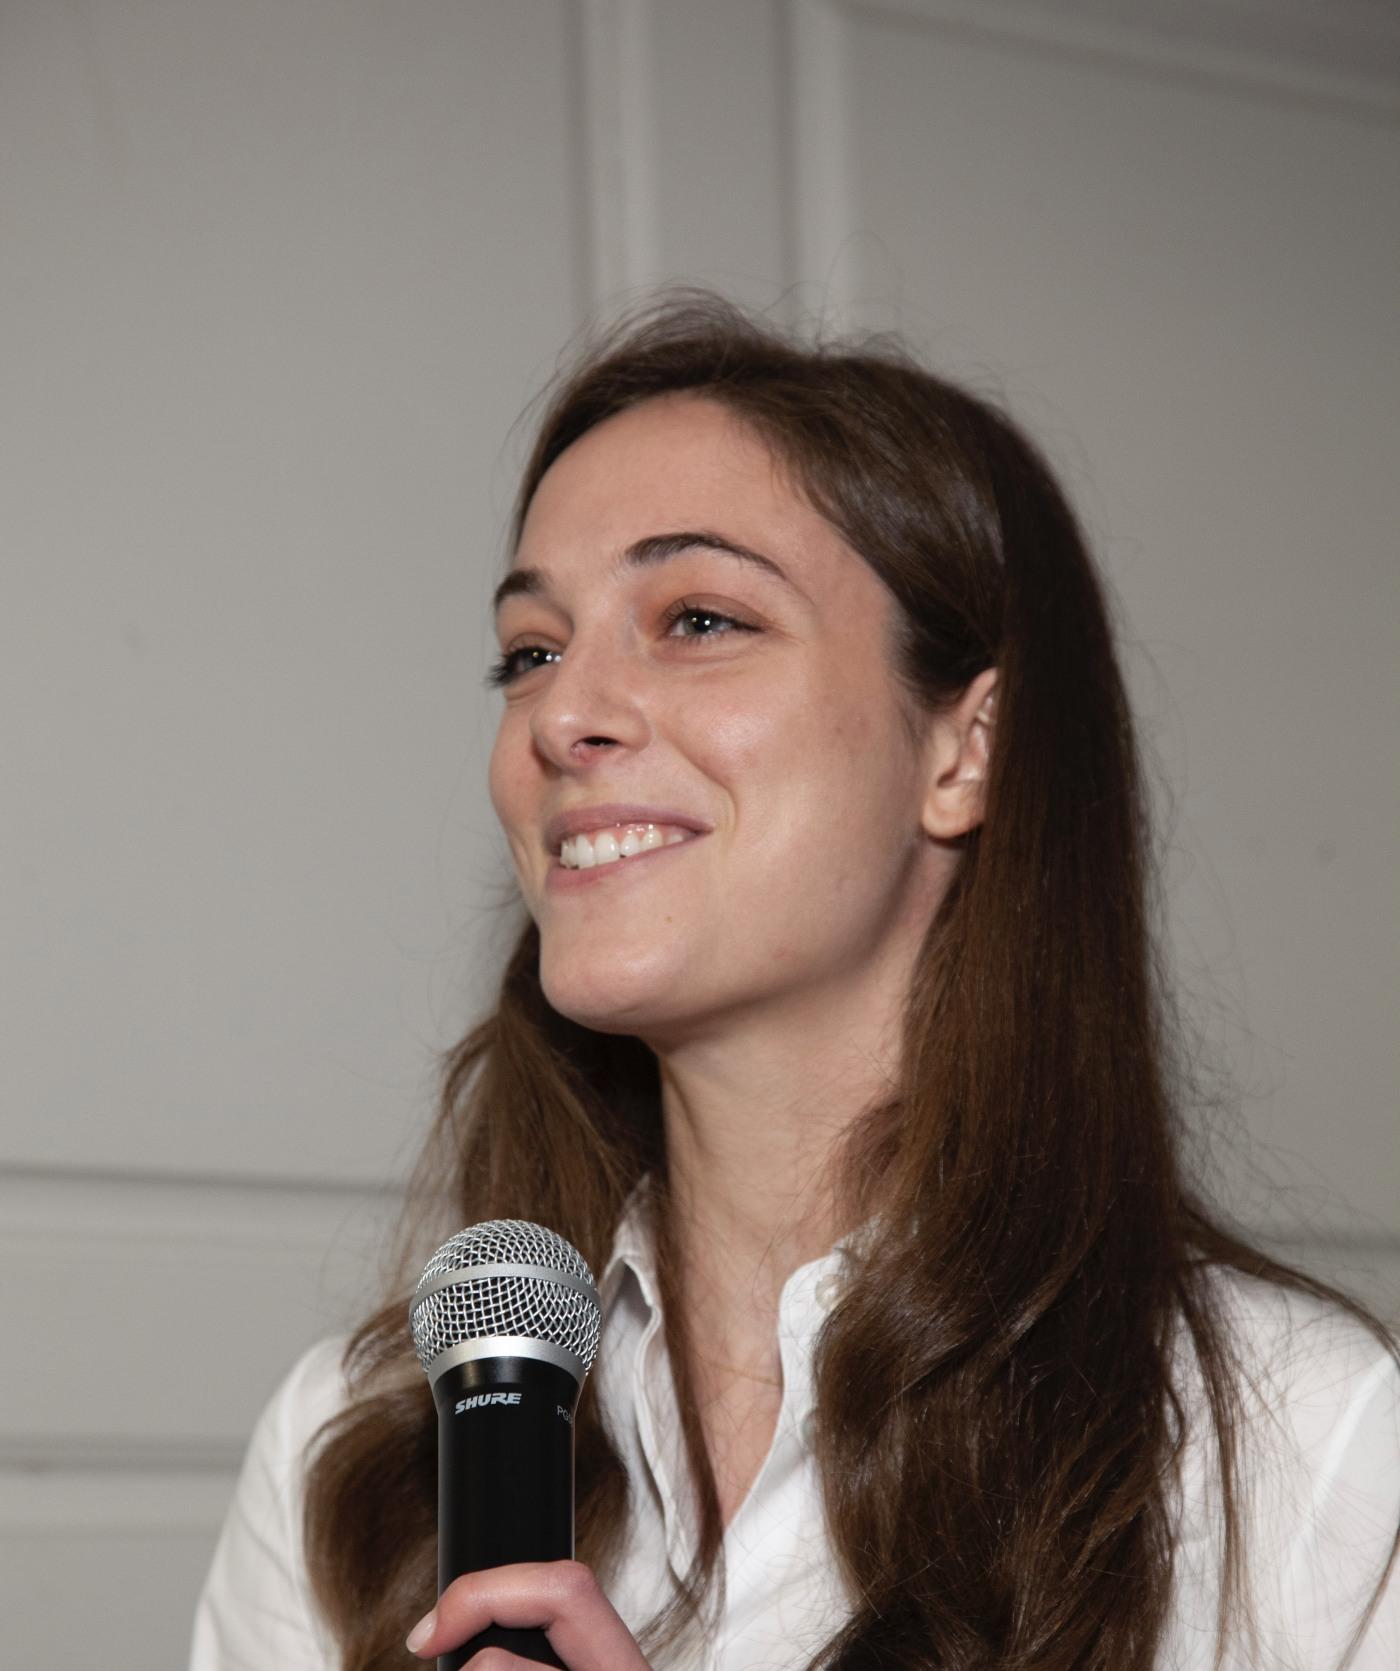 Madeline Kratz, PA student speaker